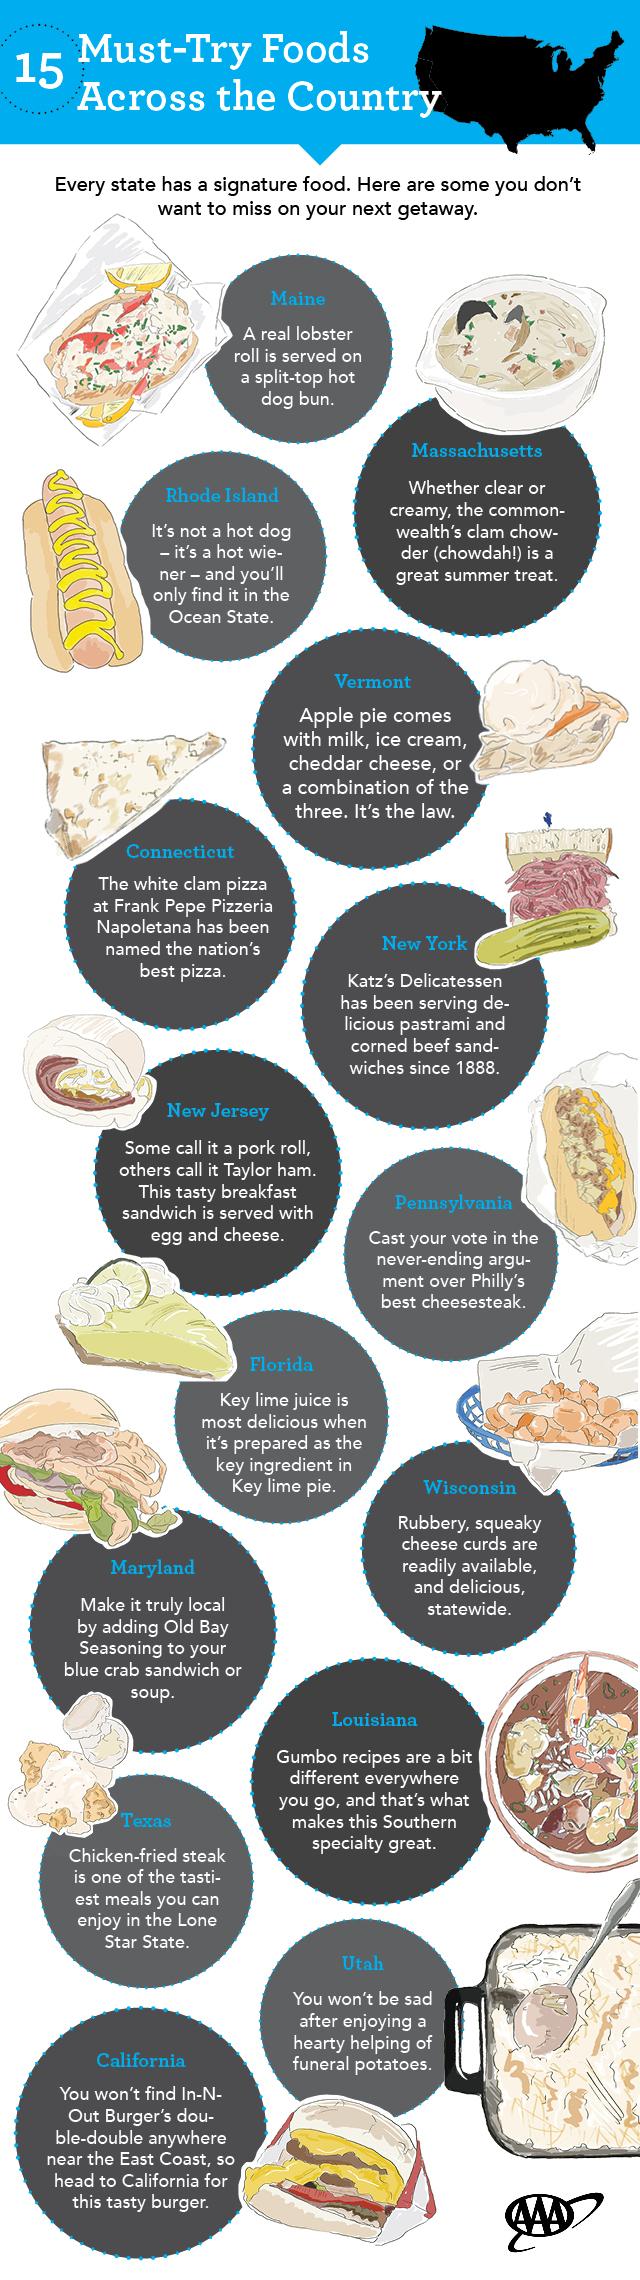 signature food